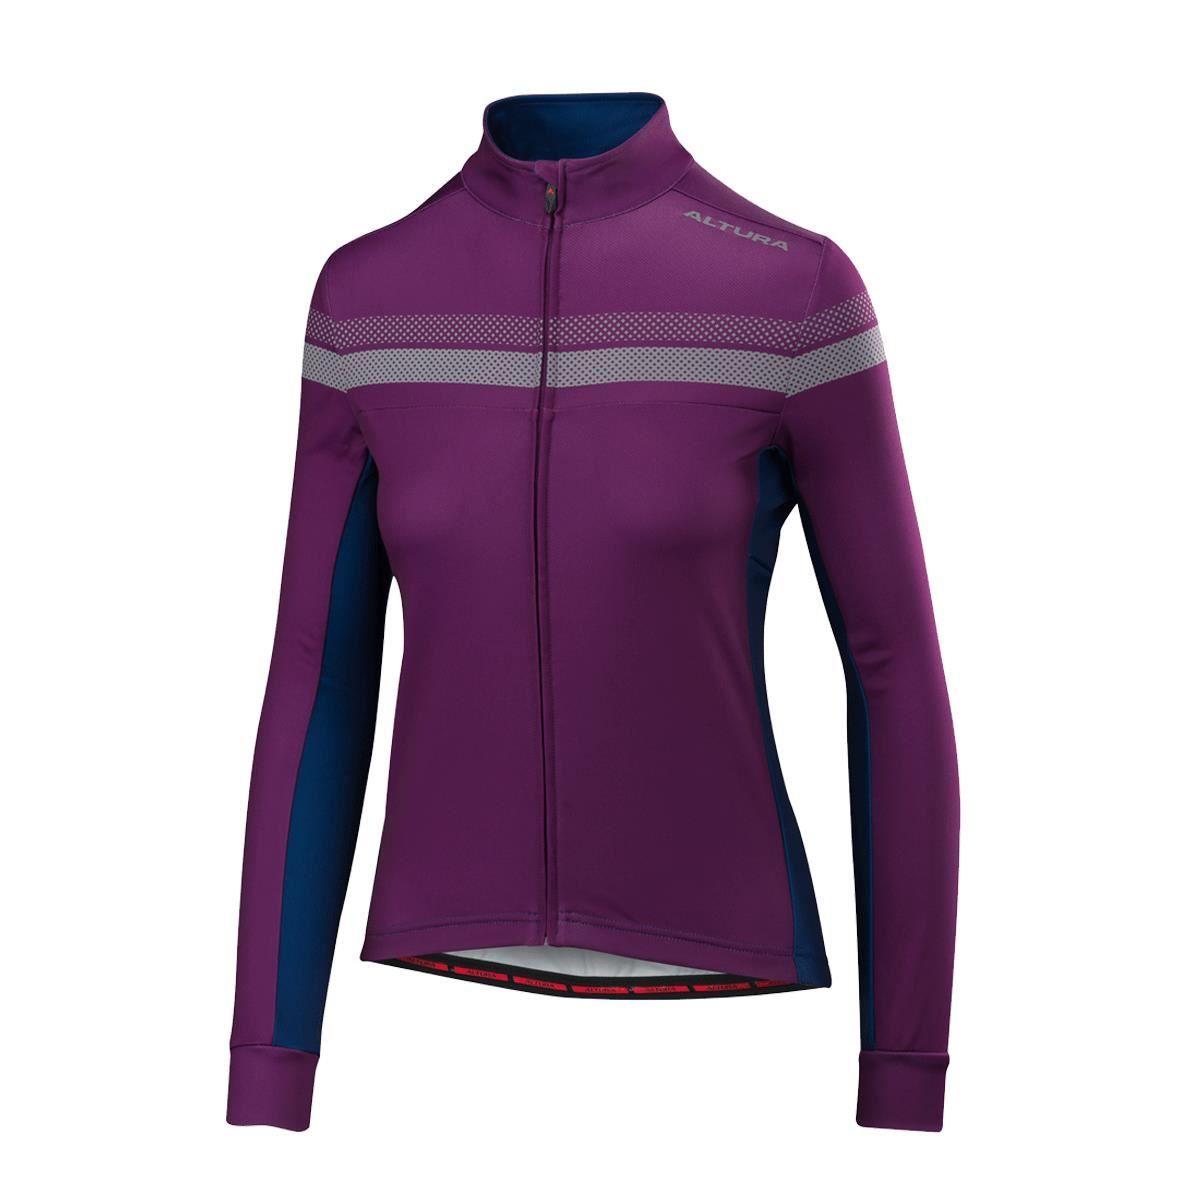 Altura Womens Nightvision 4 Long Sleeve Jersey 2018: Purple/Blue 12